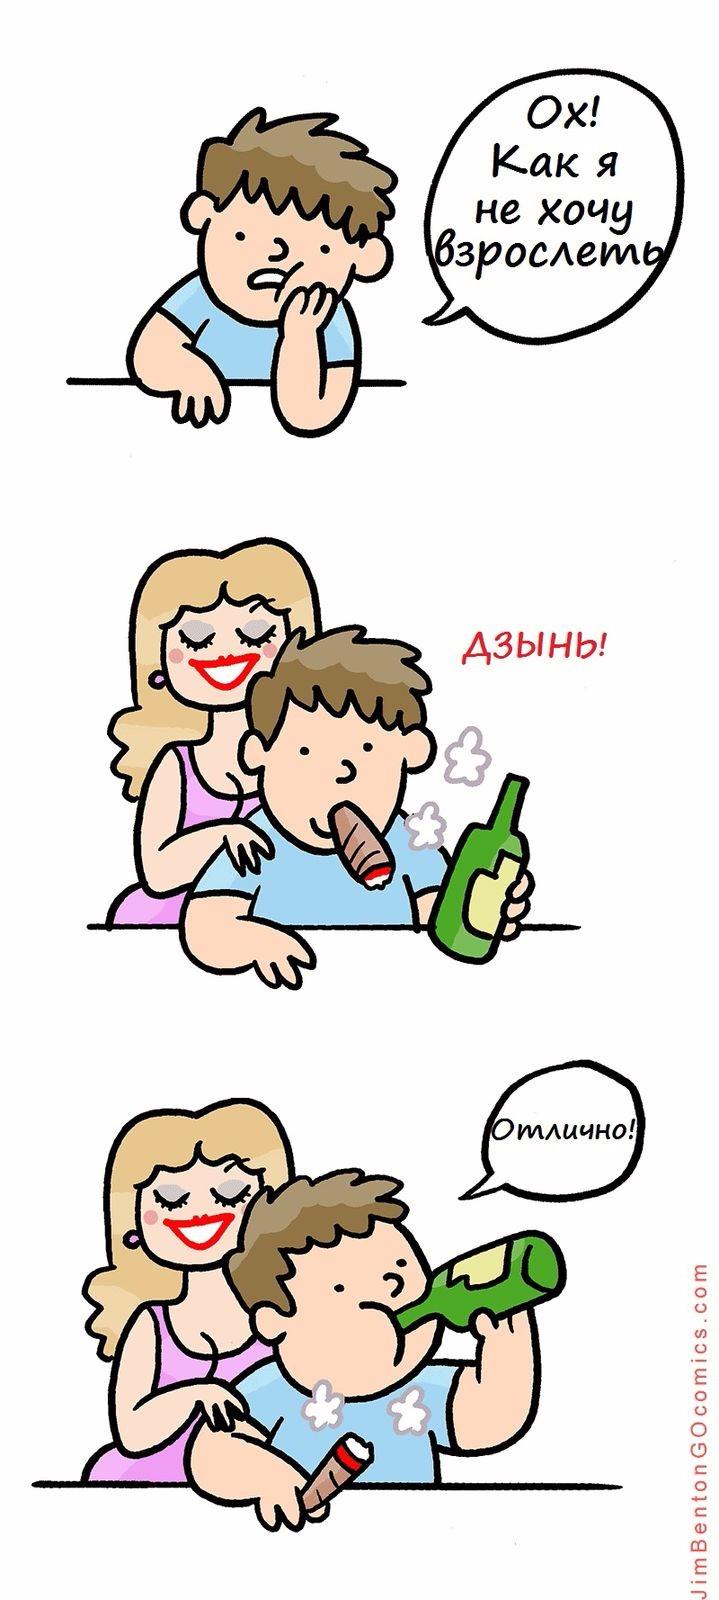 Взросление